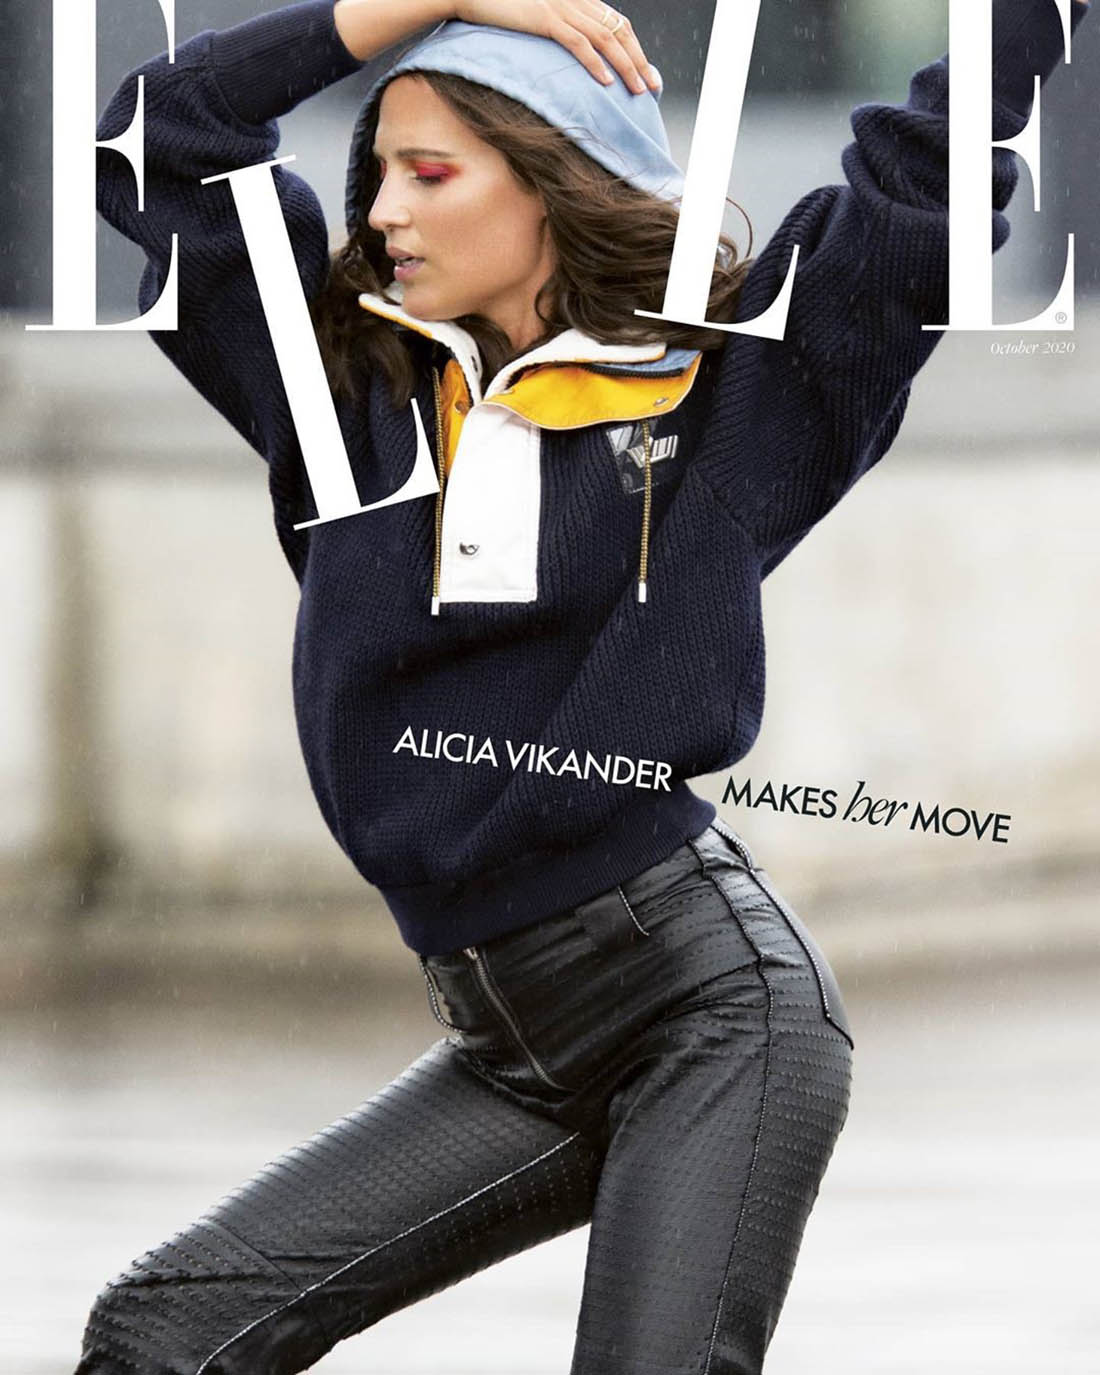 Alicia Vikander covers Elle UK October 2020 by Hans Feurer